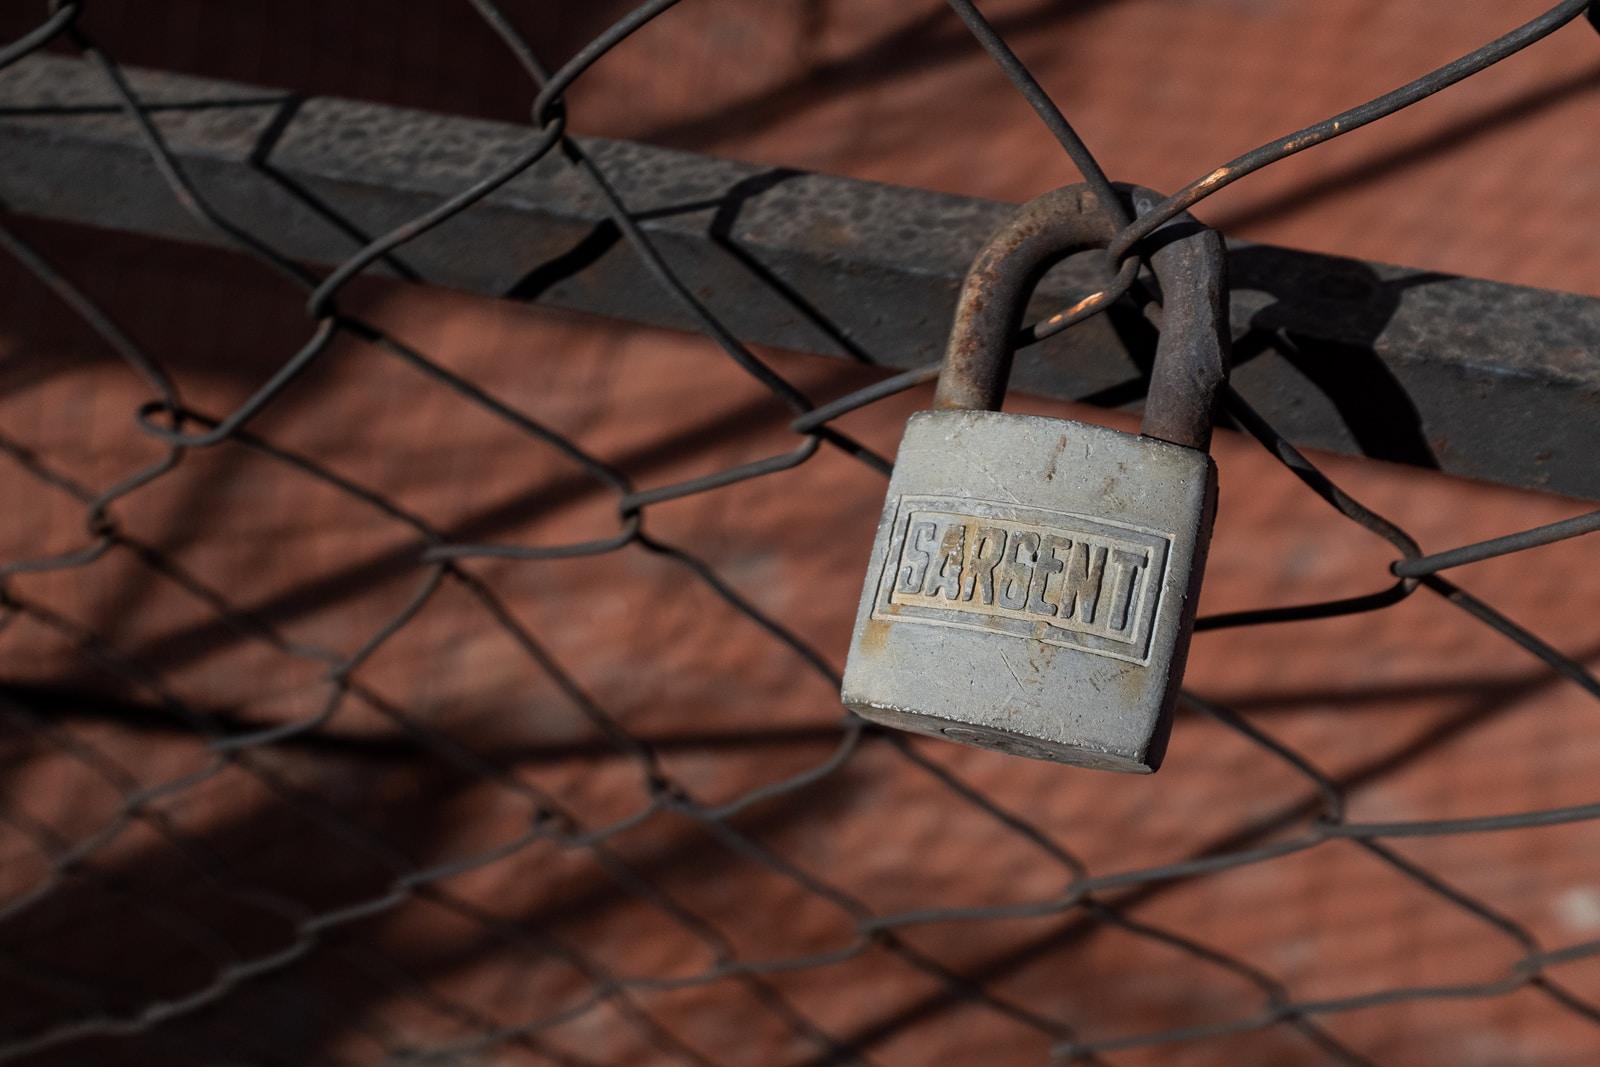 How to Break the Stigma around Mental Health in the Church